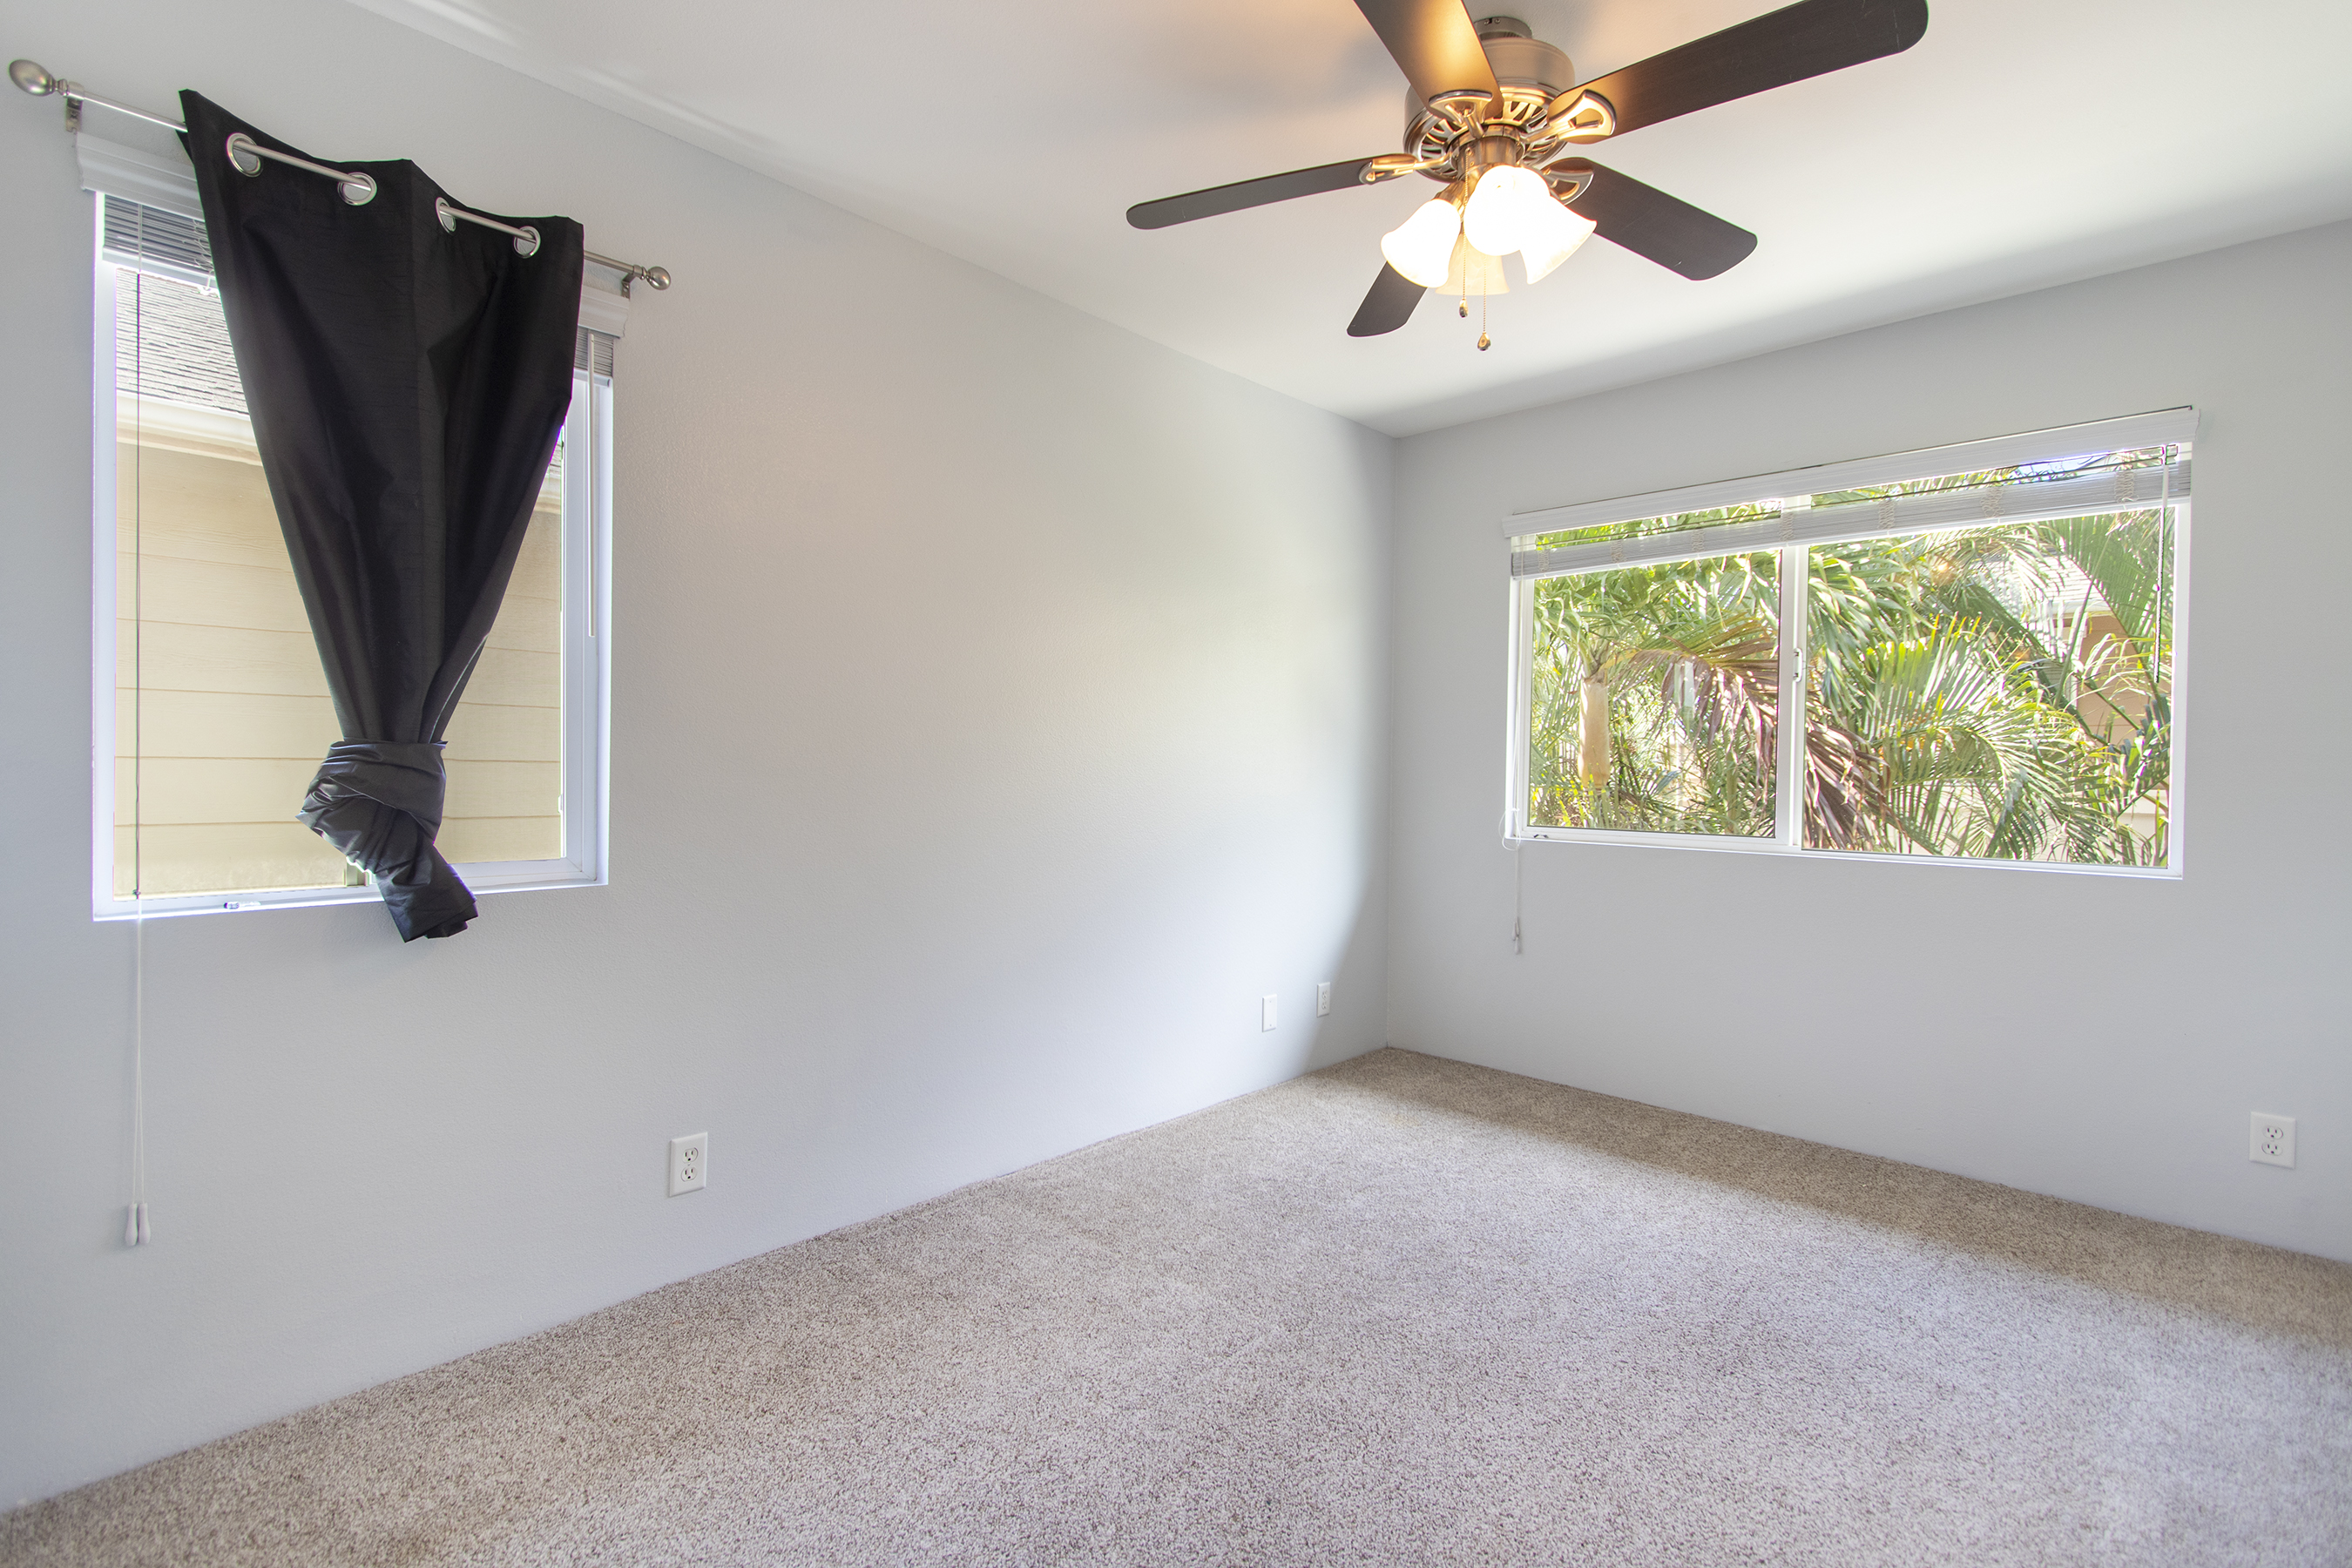 Bedroom 4 at 91-1200 Keaunui Drive #14